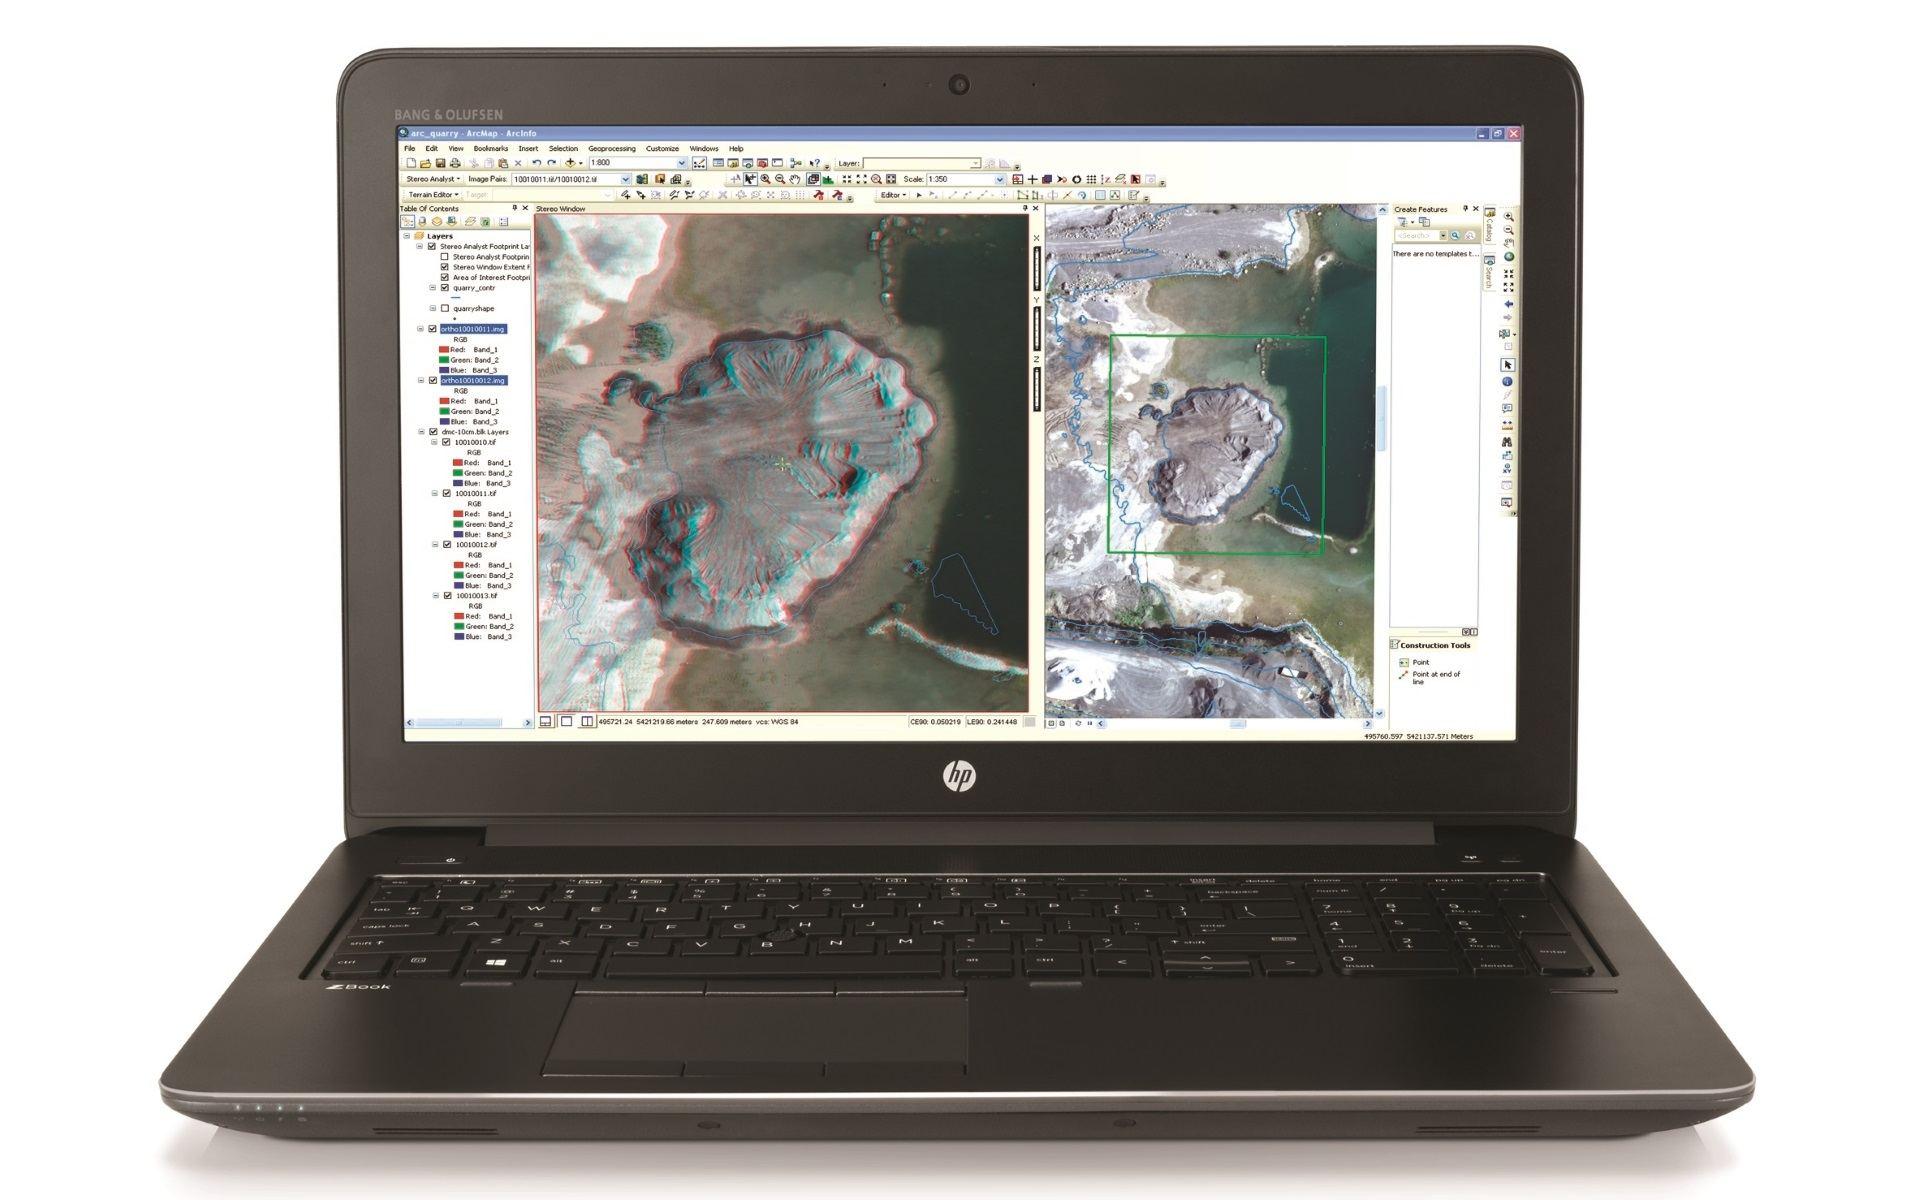 T7V54EA#BCM HP ZBook 15 G3 FHD/i7-6700HQ/8GB/256SSD/NVIDIA M2000/VGA/HDMI/TB/RJ45/WFI/BT/MCR/FPR/3RServis/7+W10P